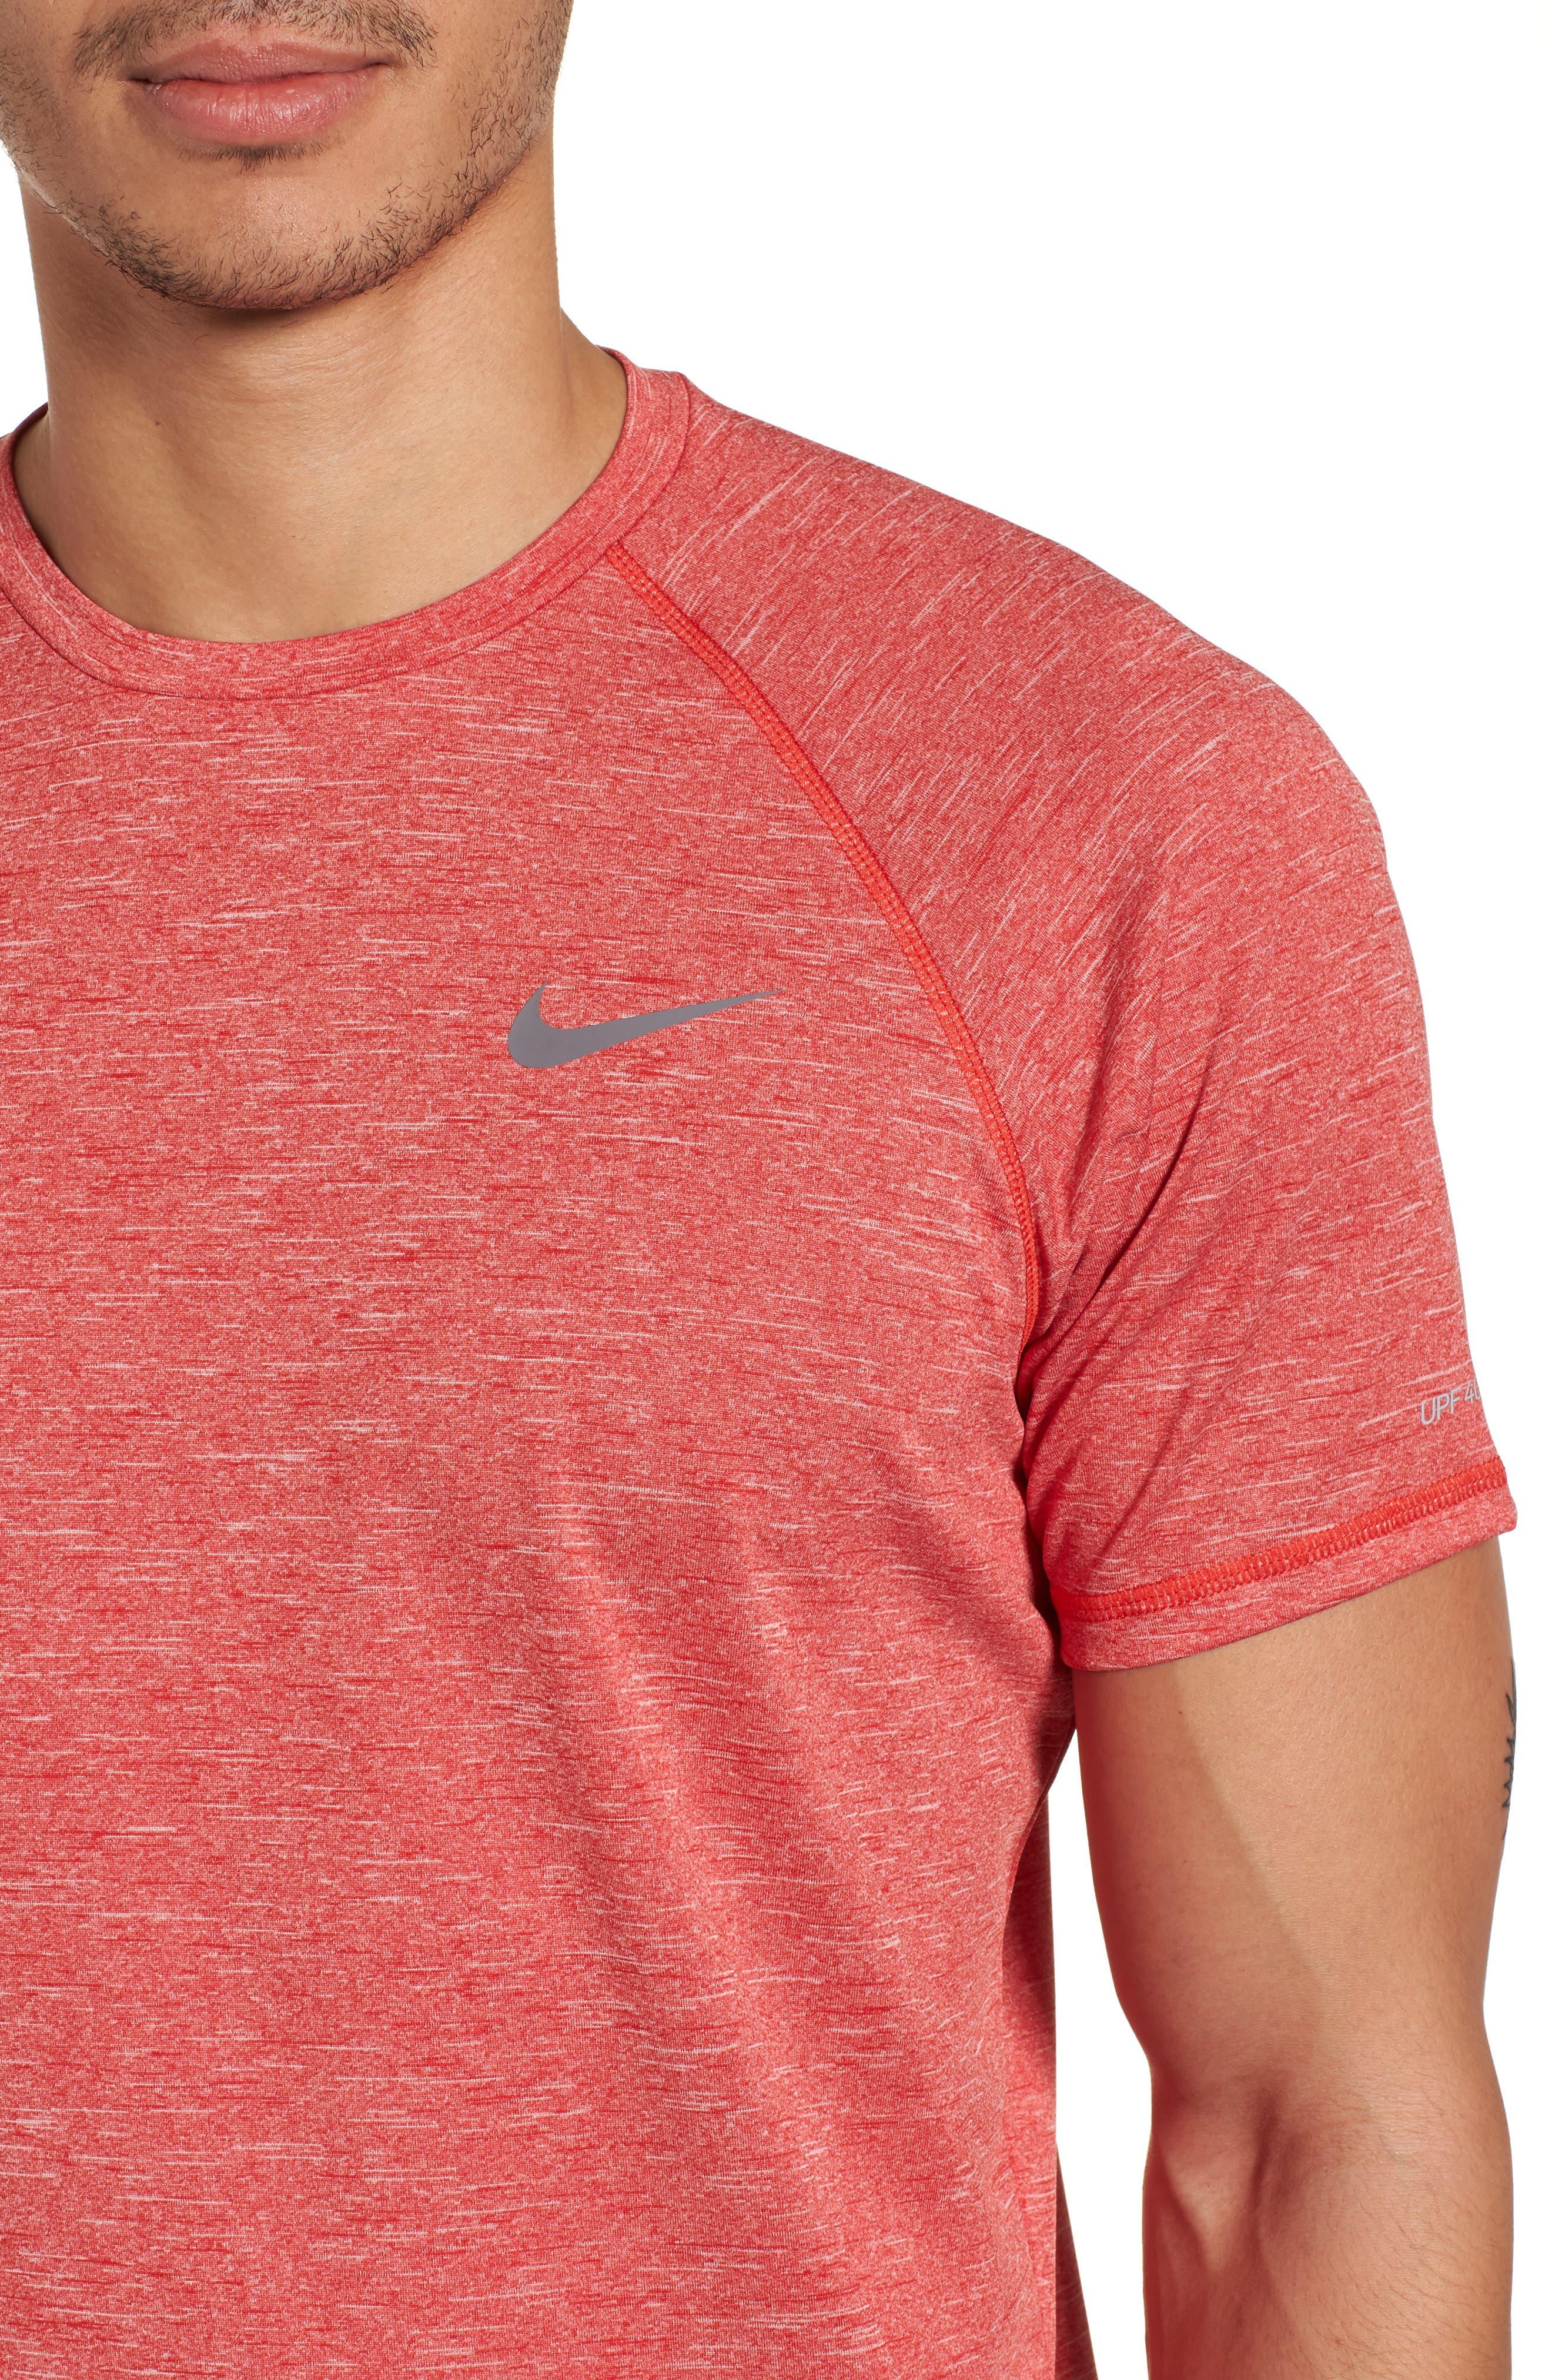 Dry Hydroguard T-Shirt,                             Alternate thumbnail 4, color,                             University Red